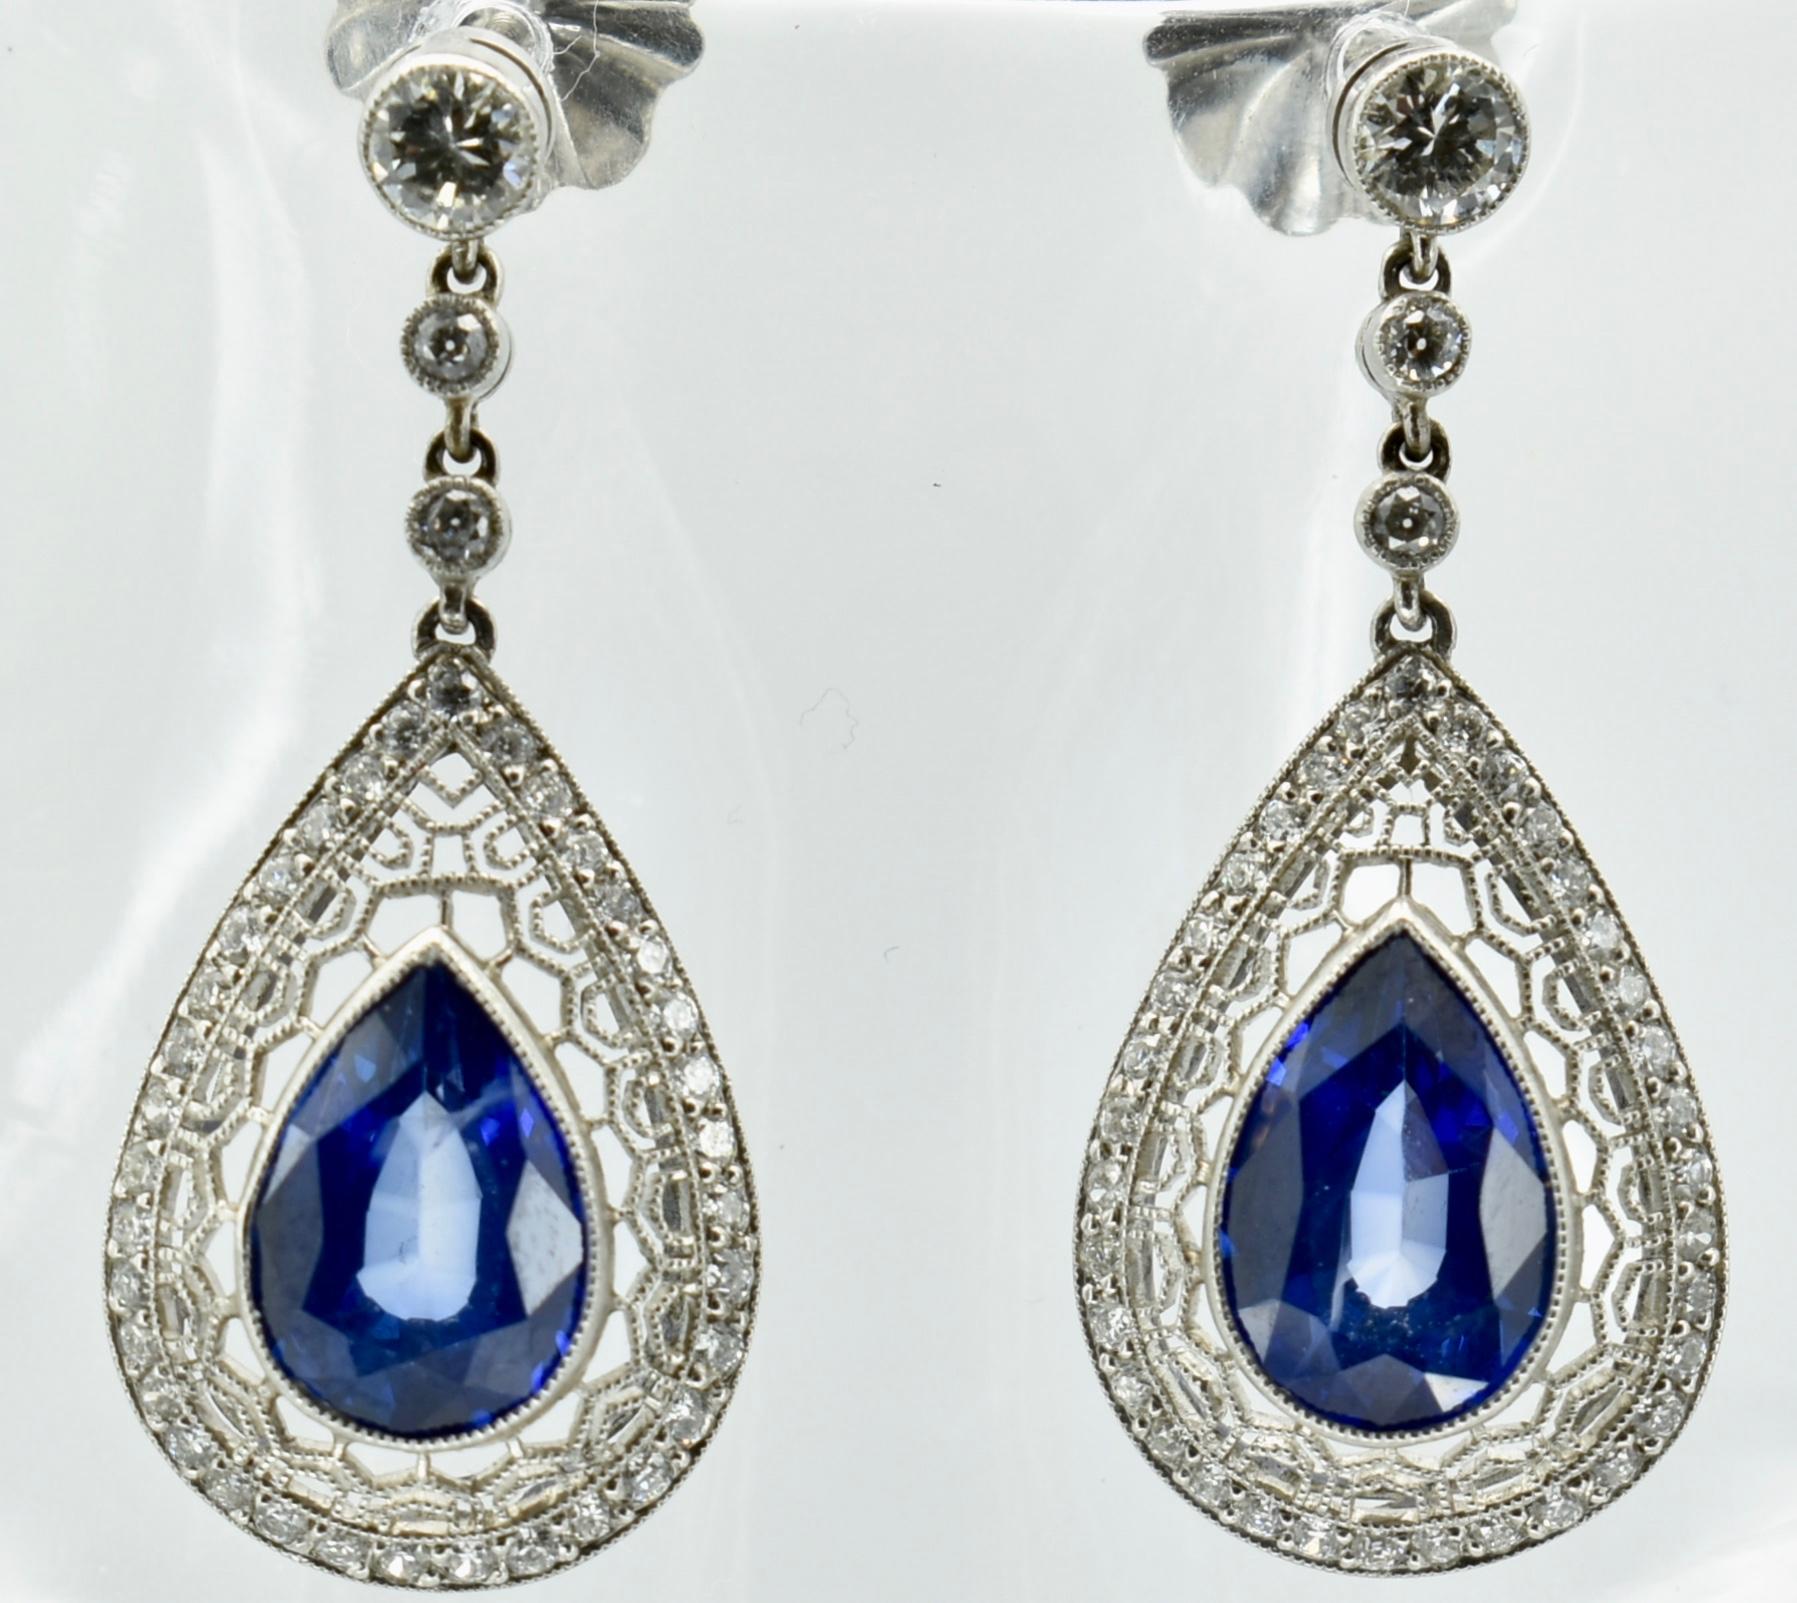 PAIR OF SAPPHIRE & DIAMOND PENDANT EARRINGS - Image 2 of 4